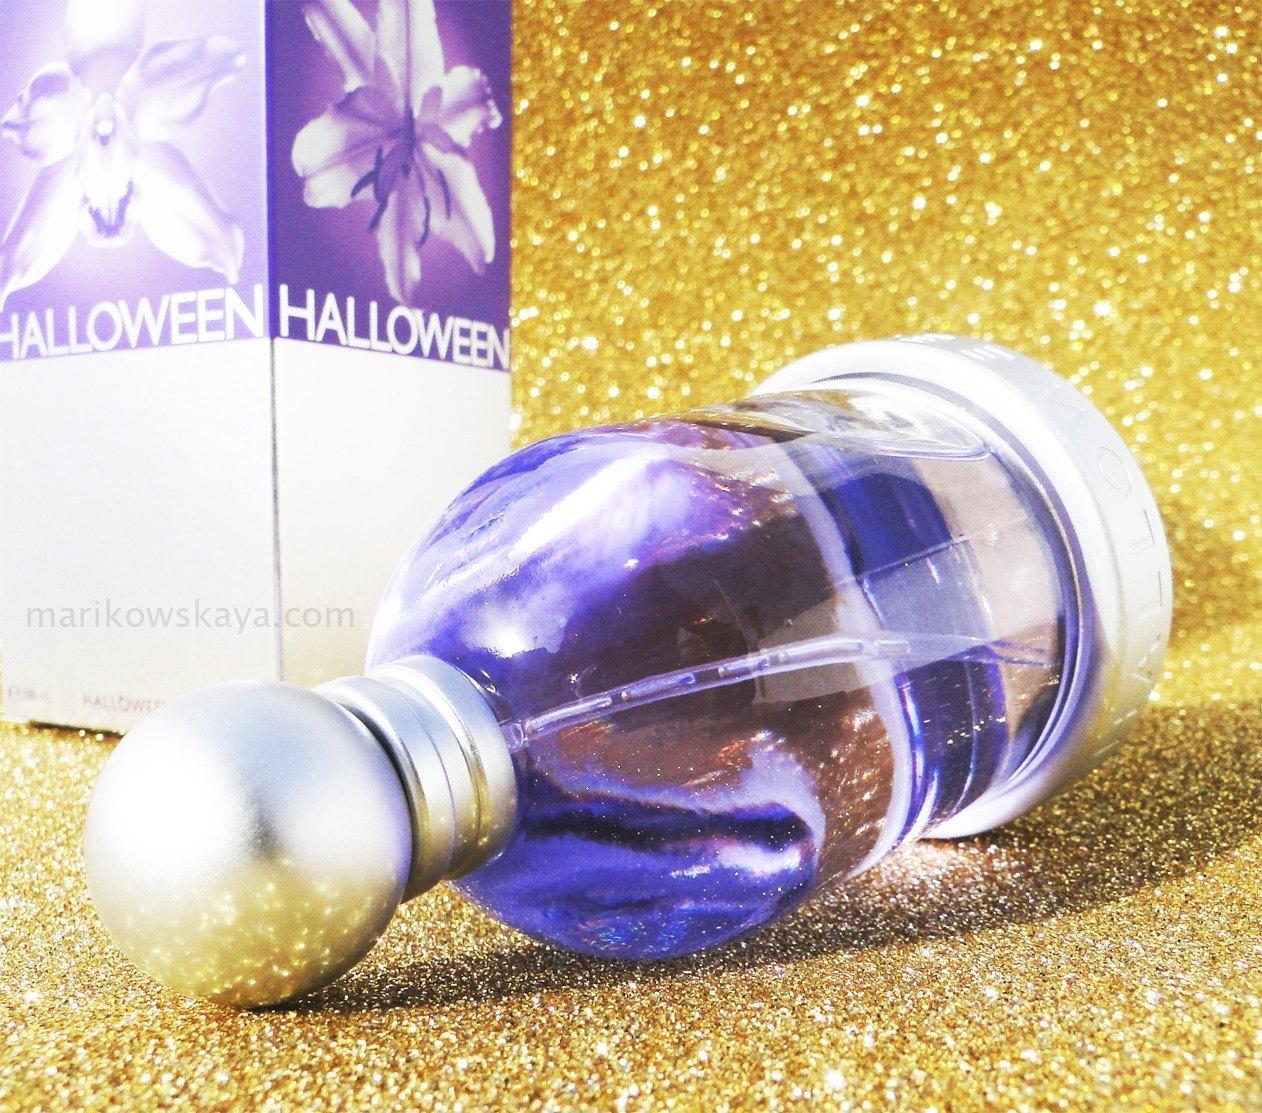 marikoxmas halloween perfumes 4